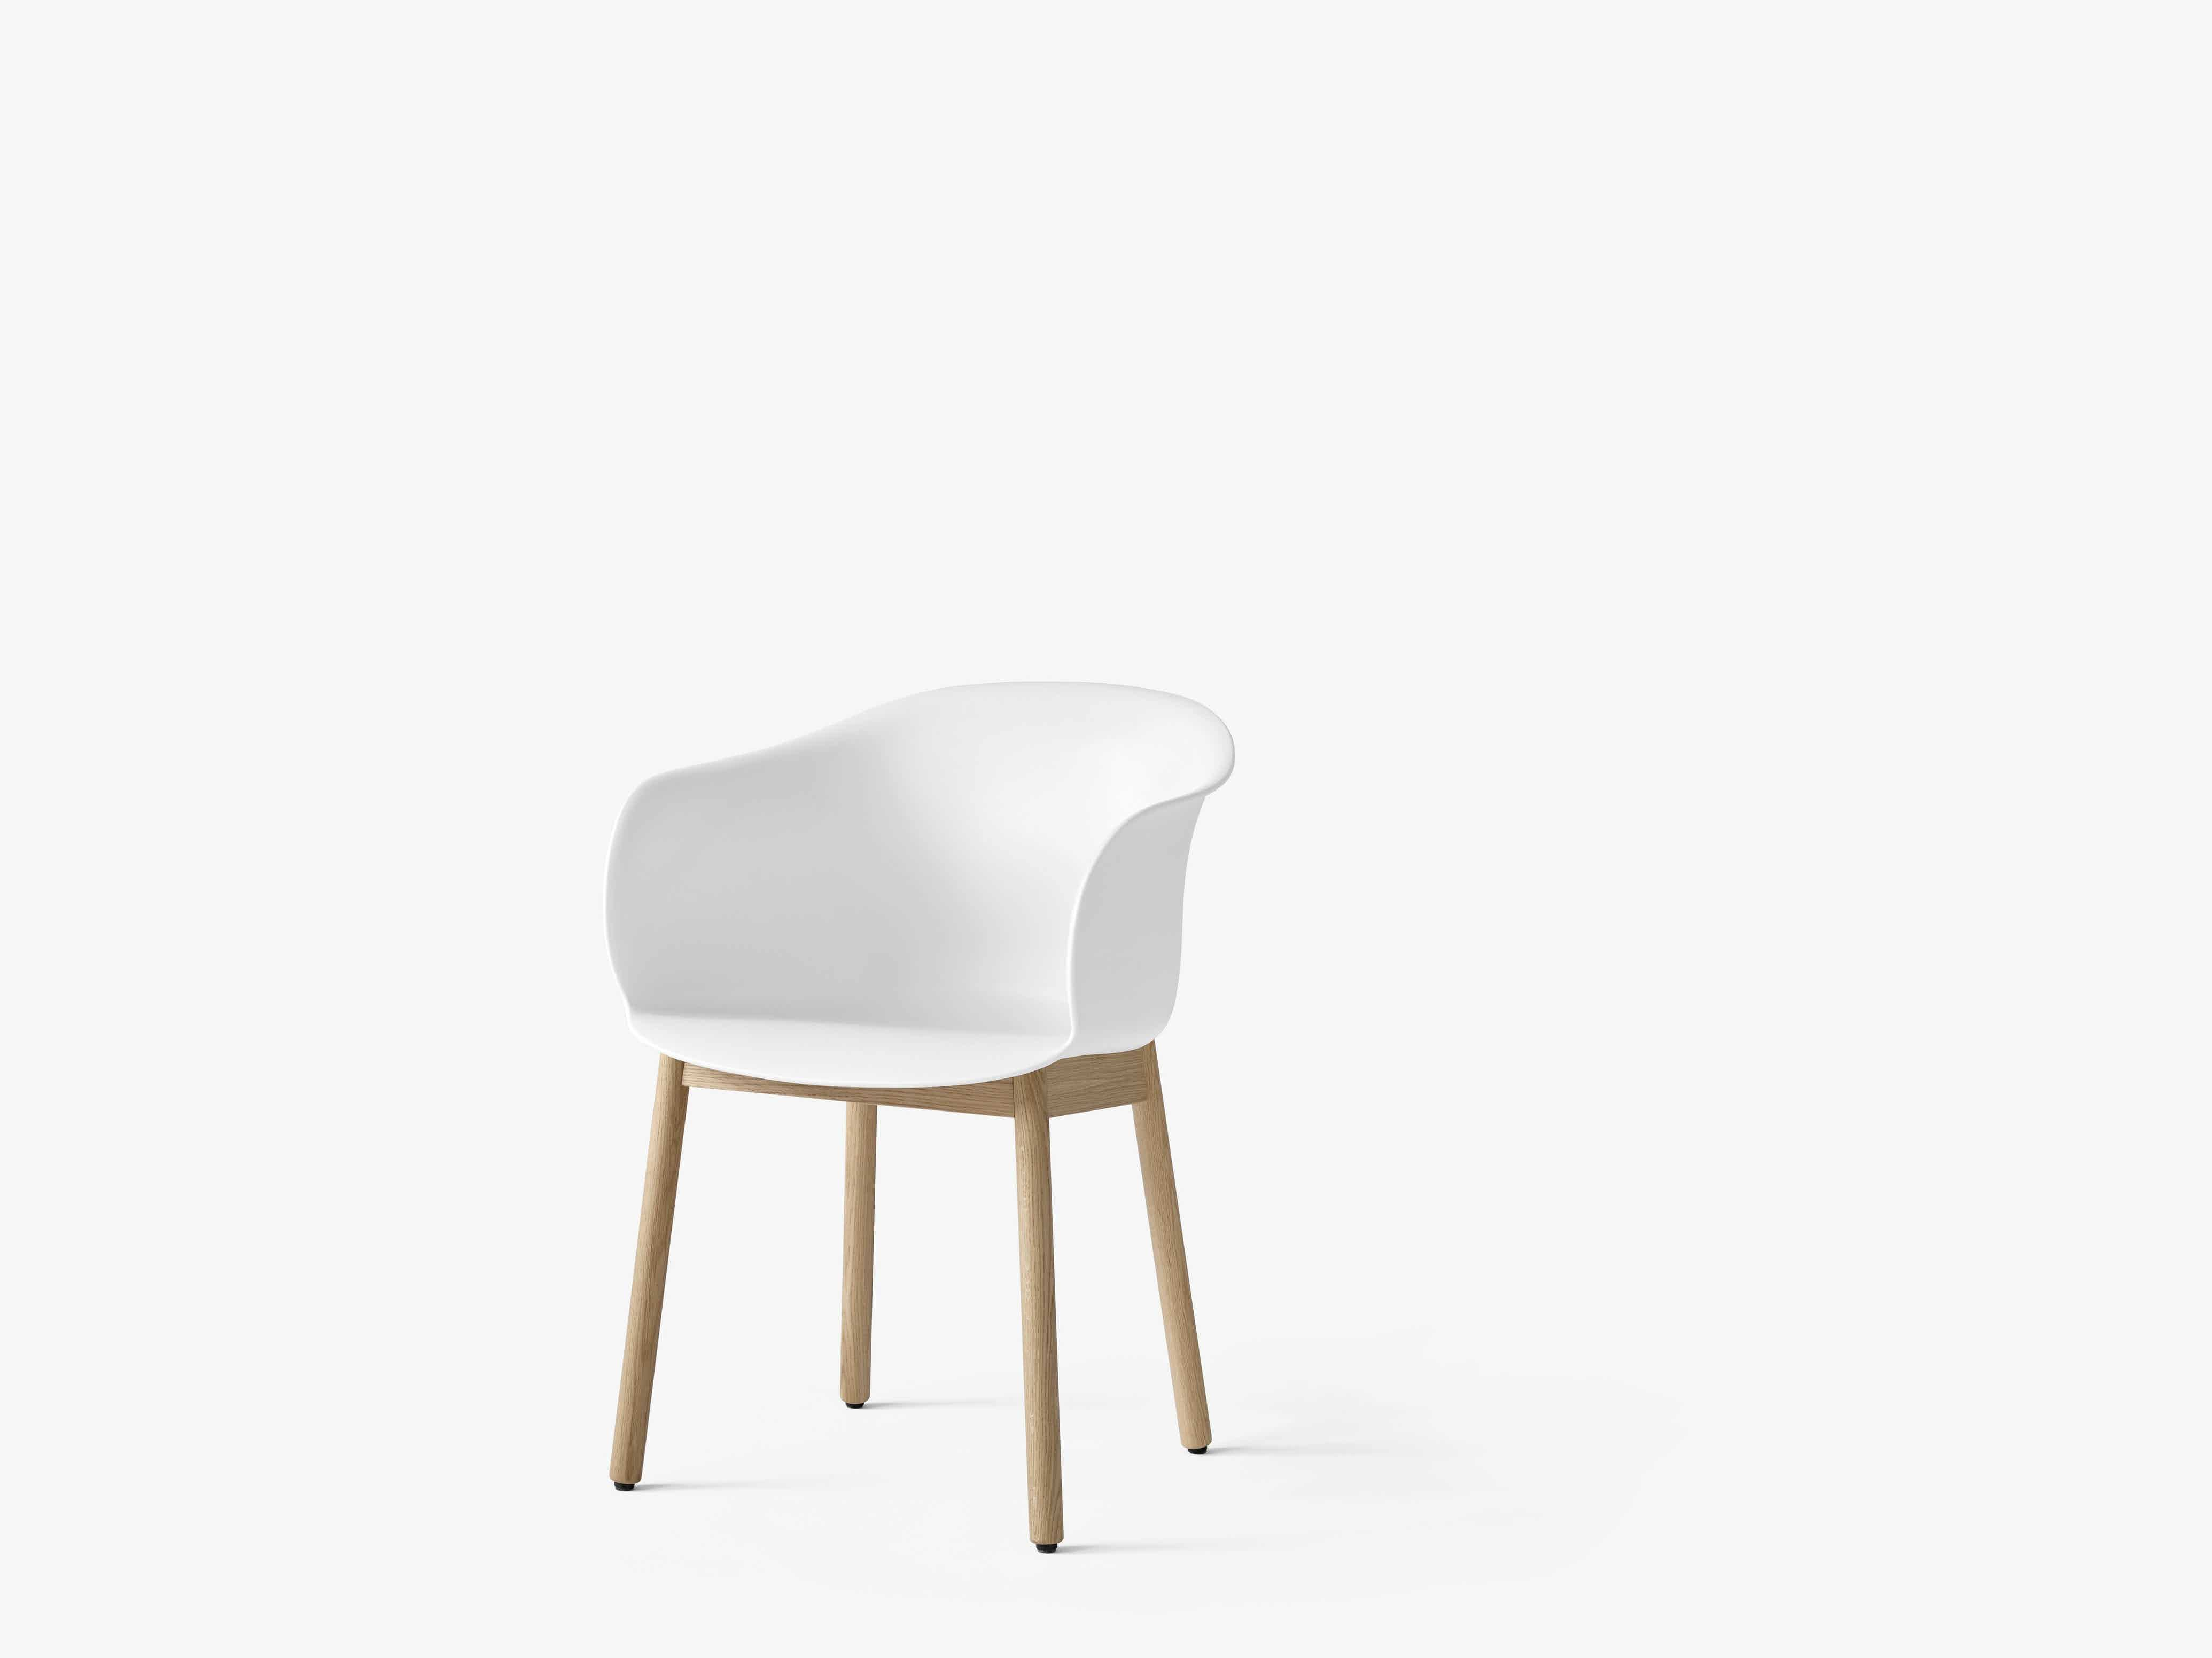 Andtradition-elefy-chair-white-oak-base-white-seat-haute-living